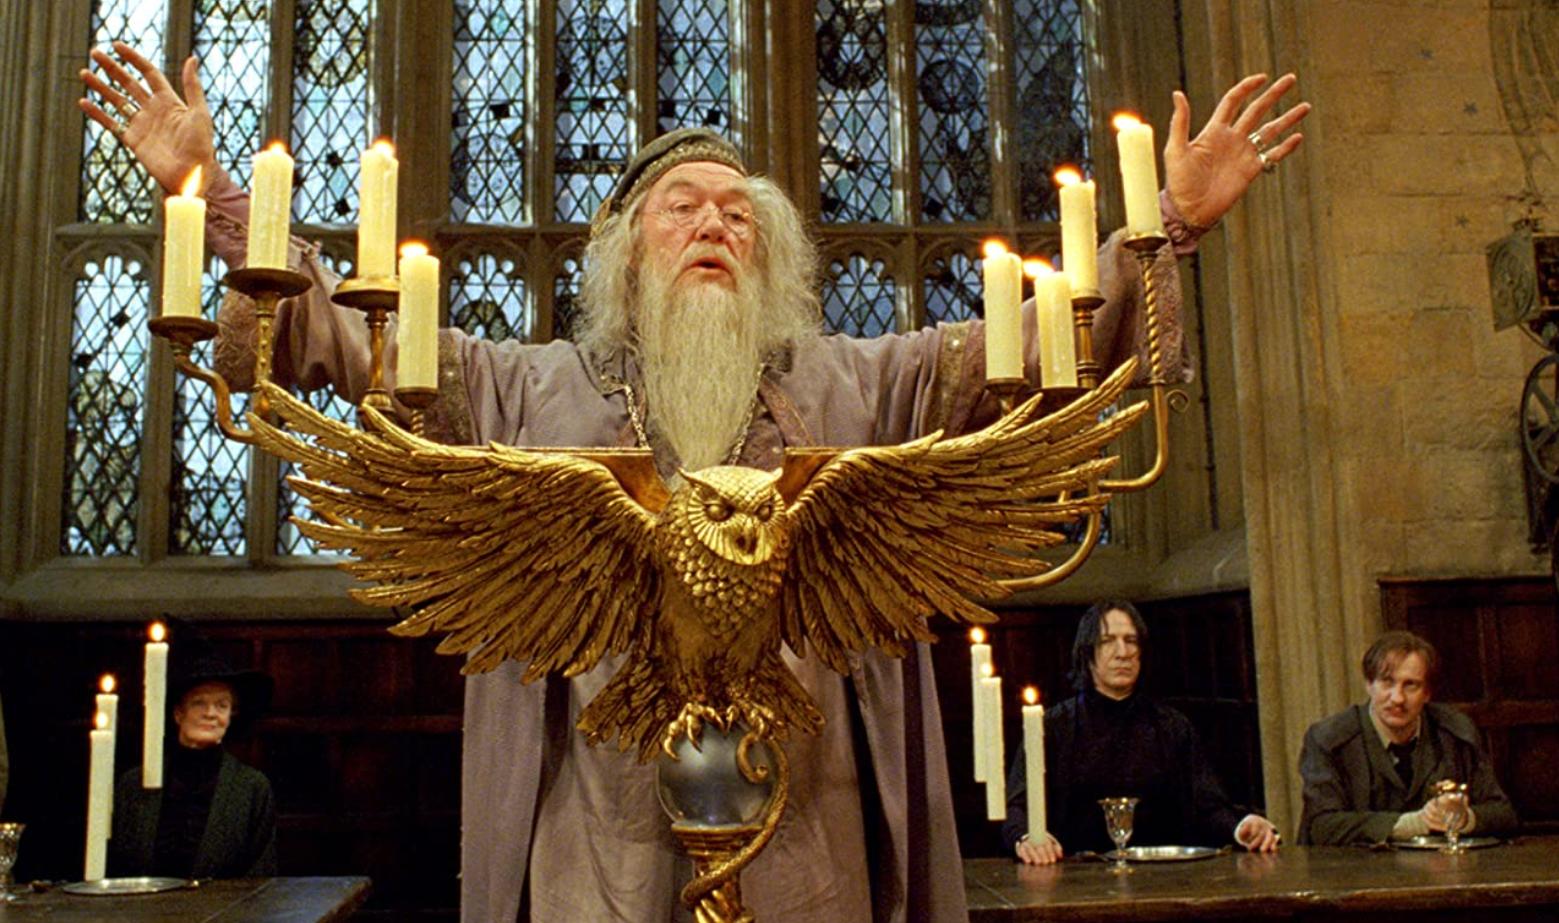 Michael Gambon as Albus Dumbledore.